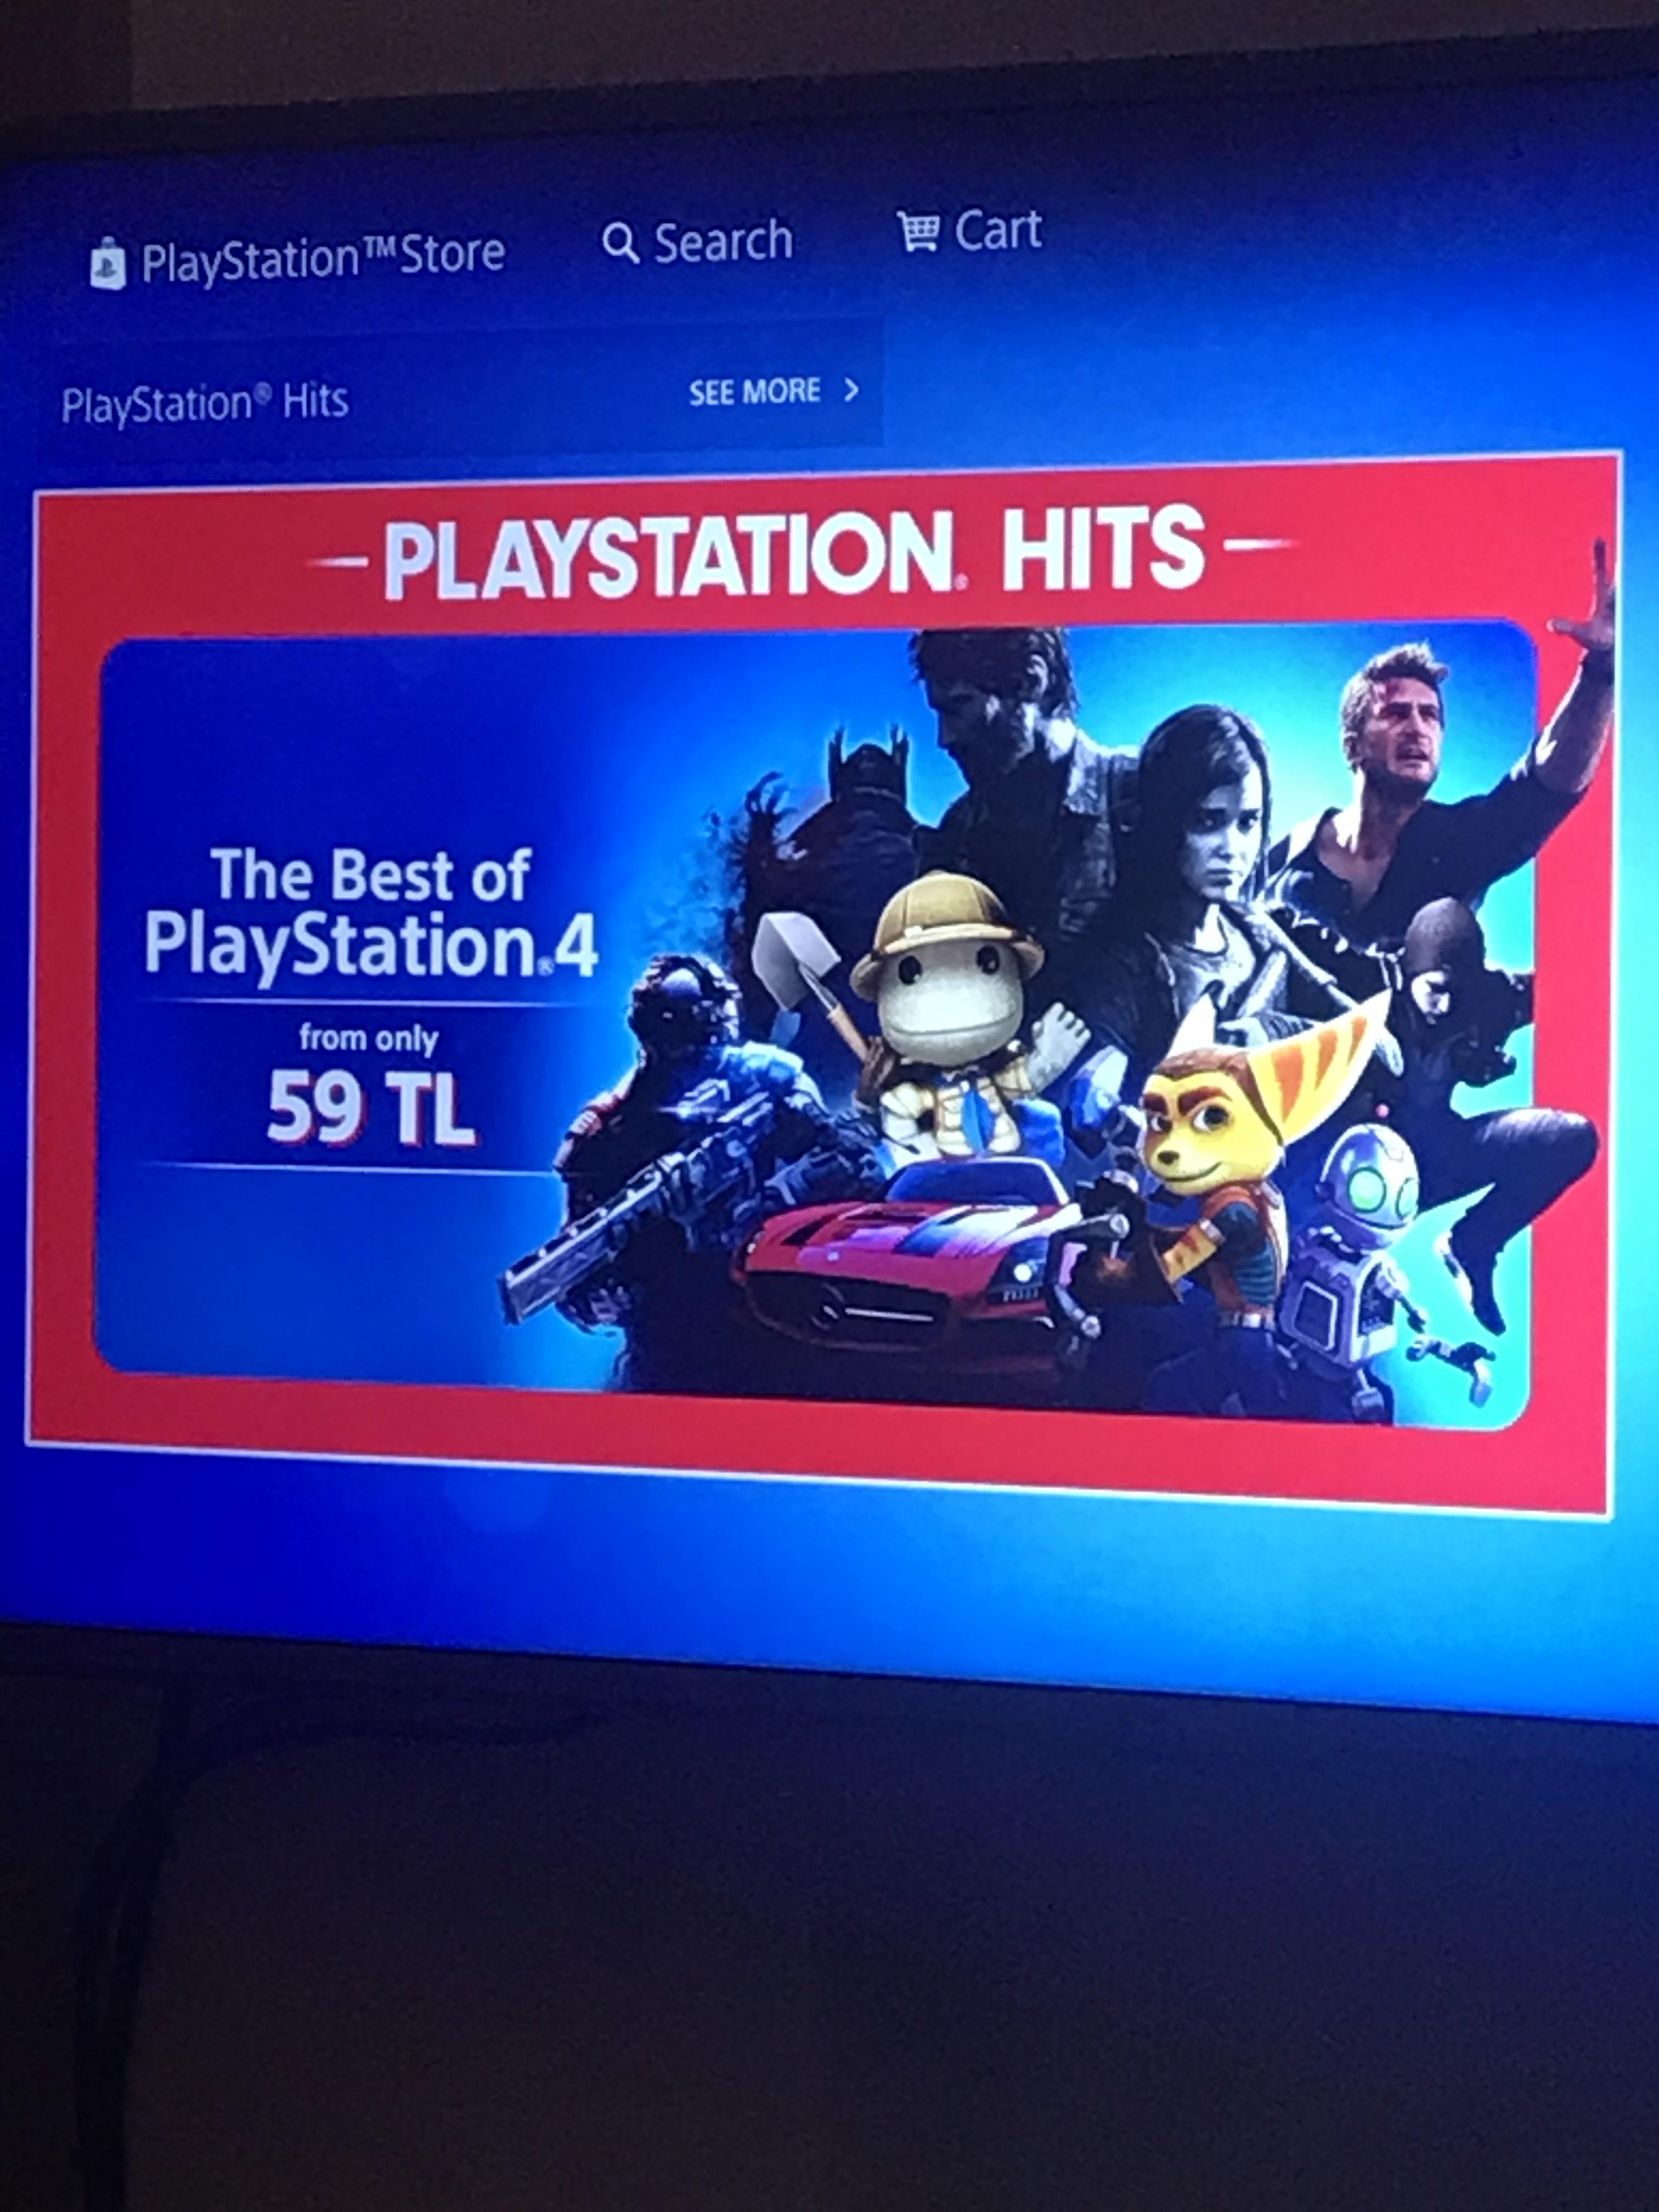 Best Of Playstation 4 Digital Games! PSN Store Turkey £6.02